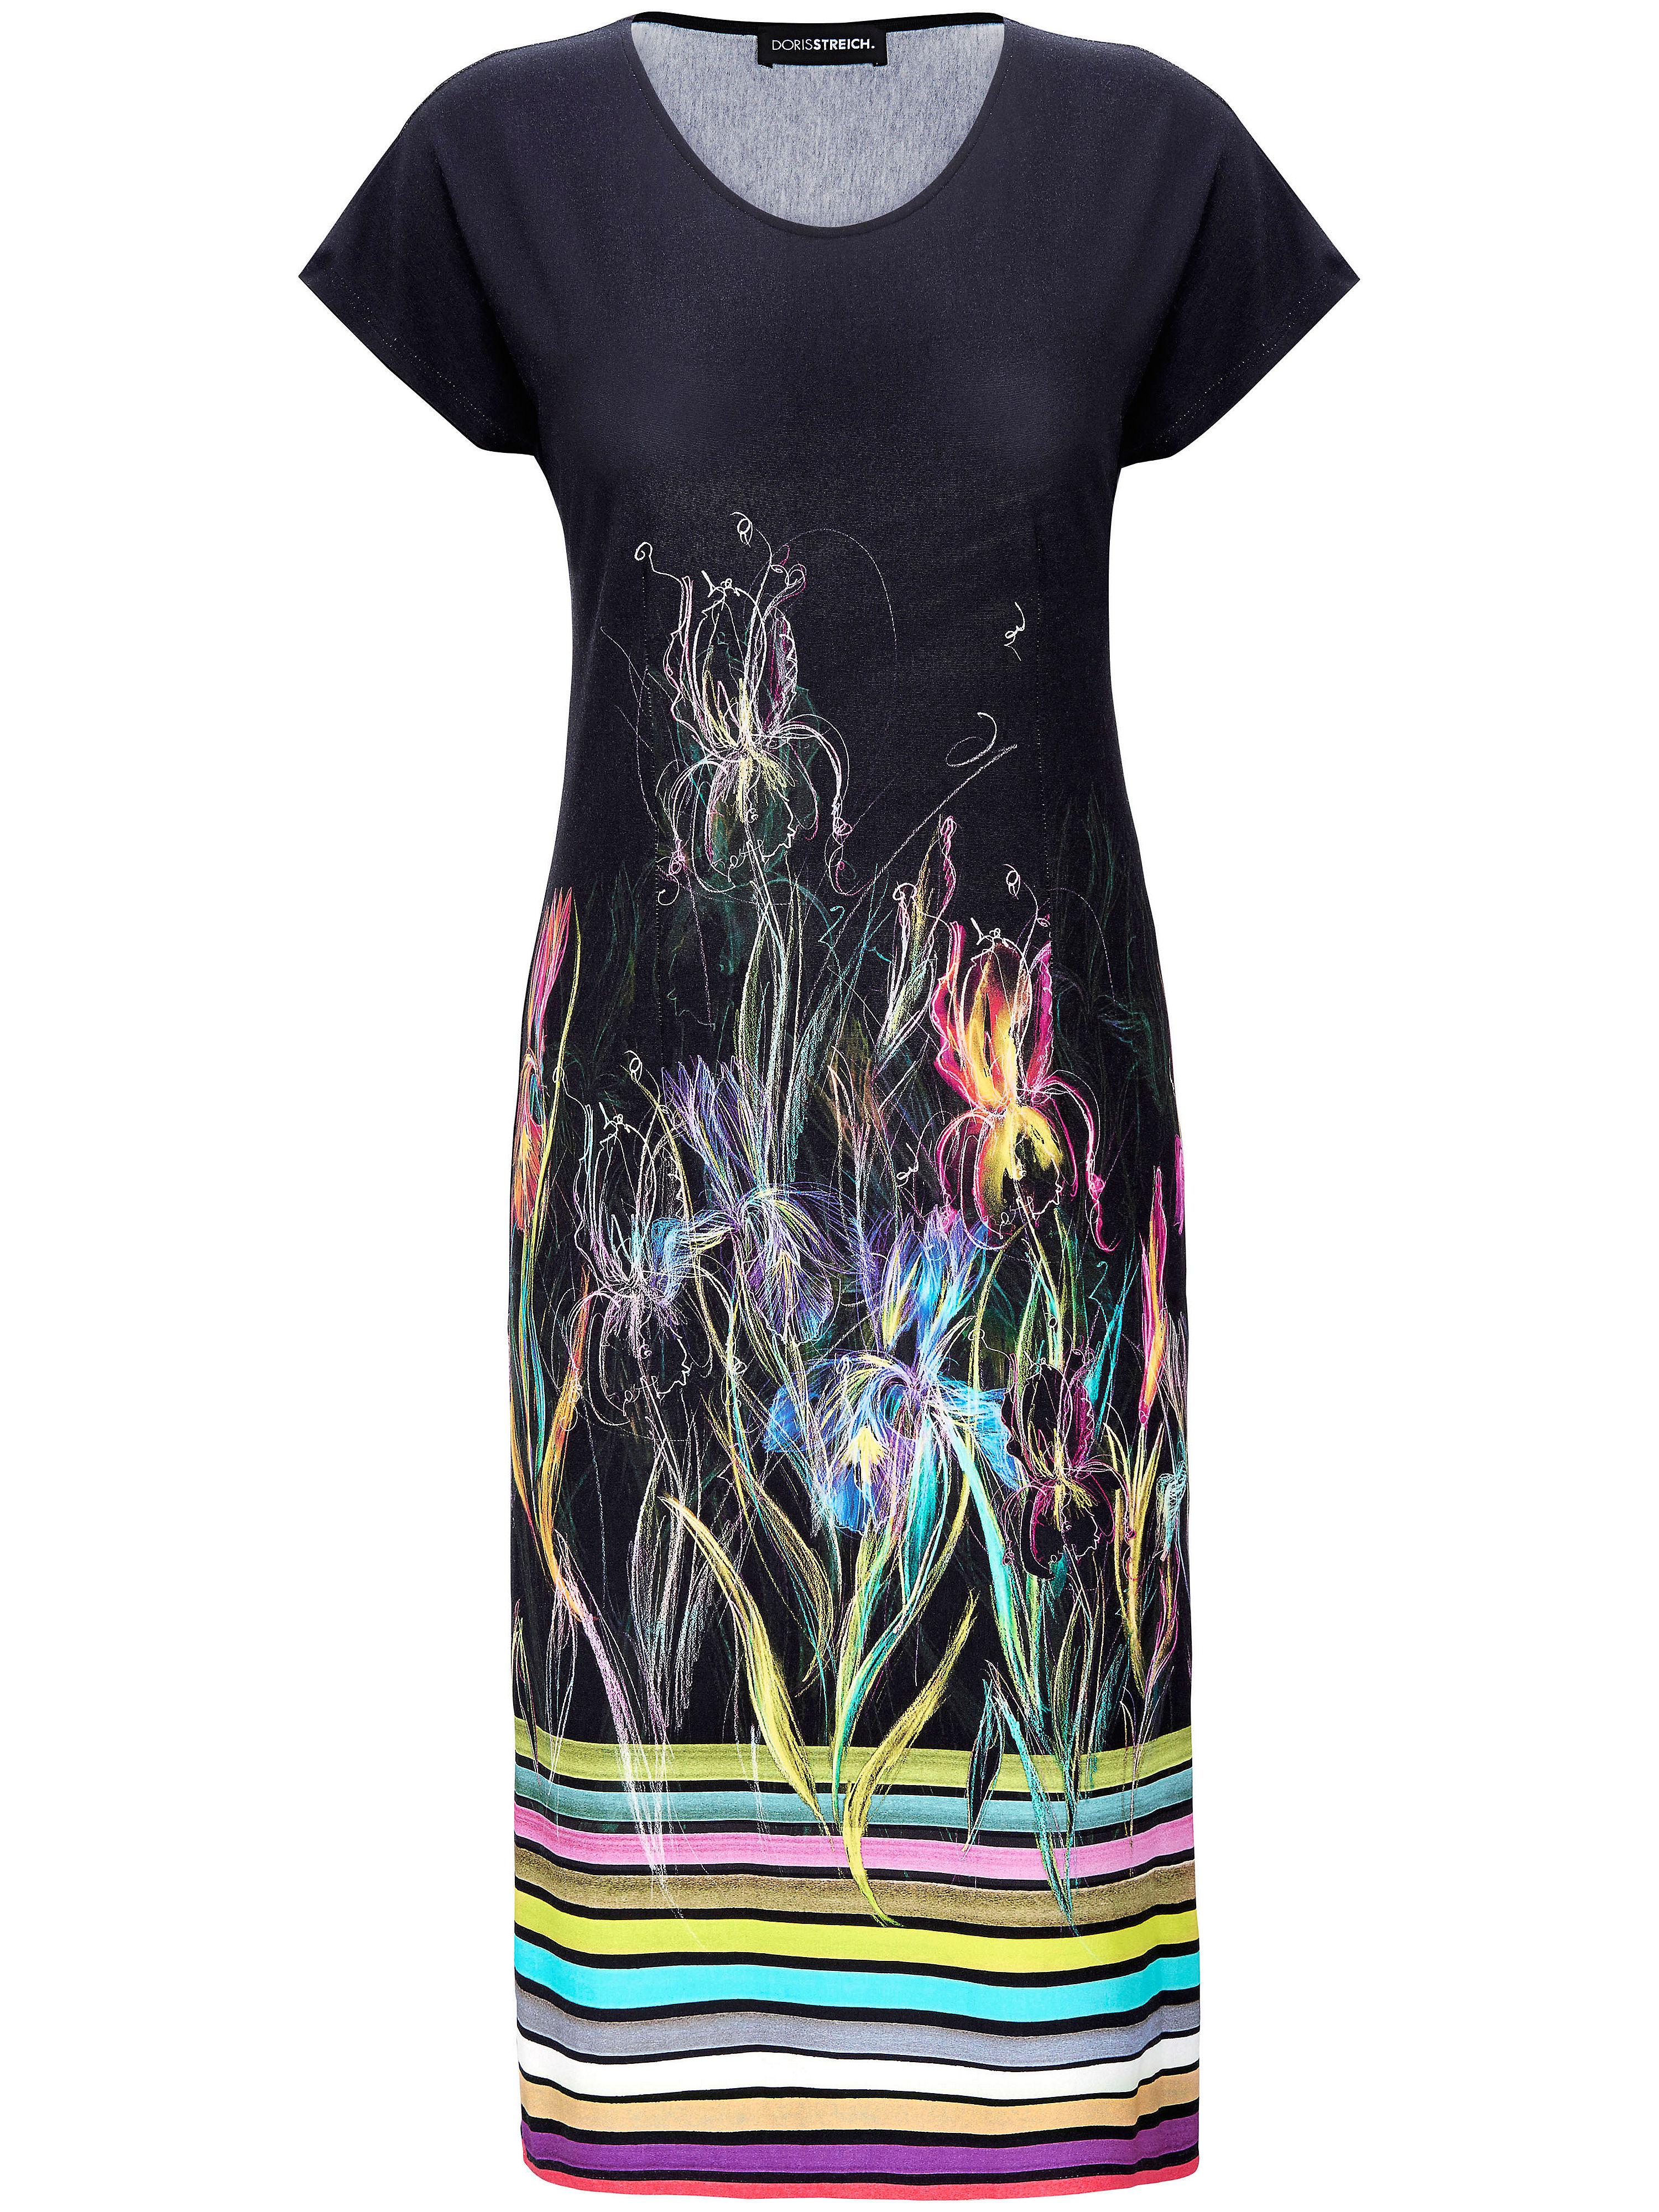 Image of   Jerseykjole Fra Doris Streich multicolor